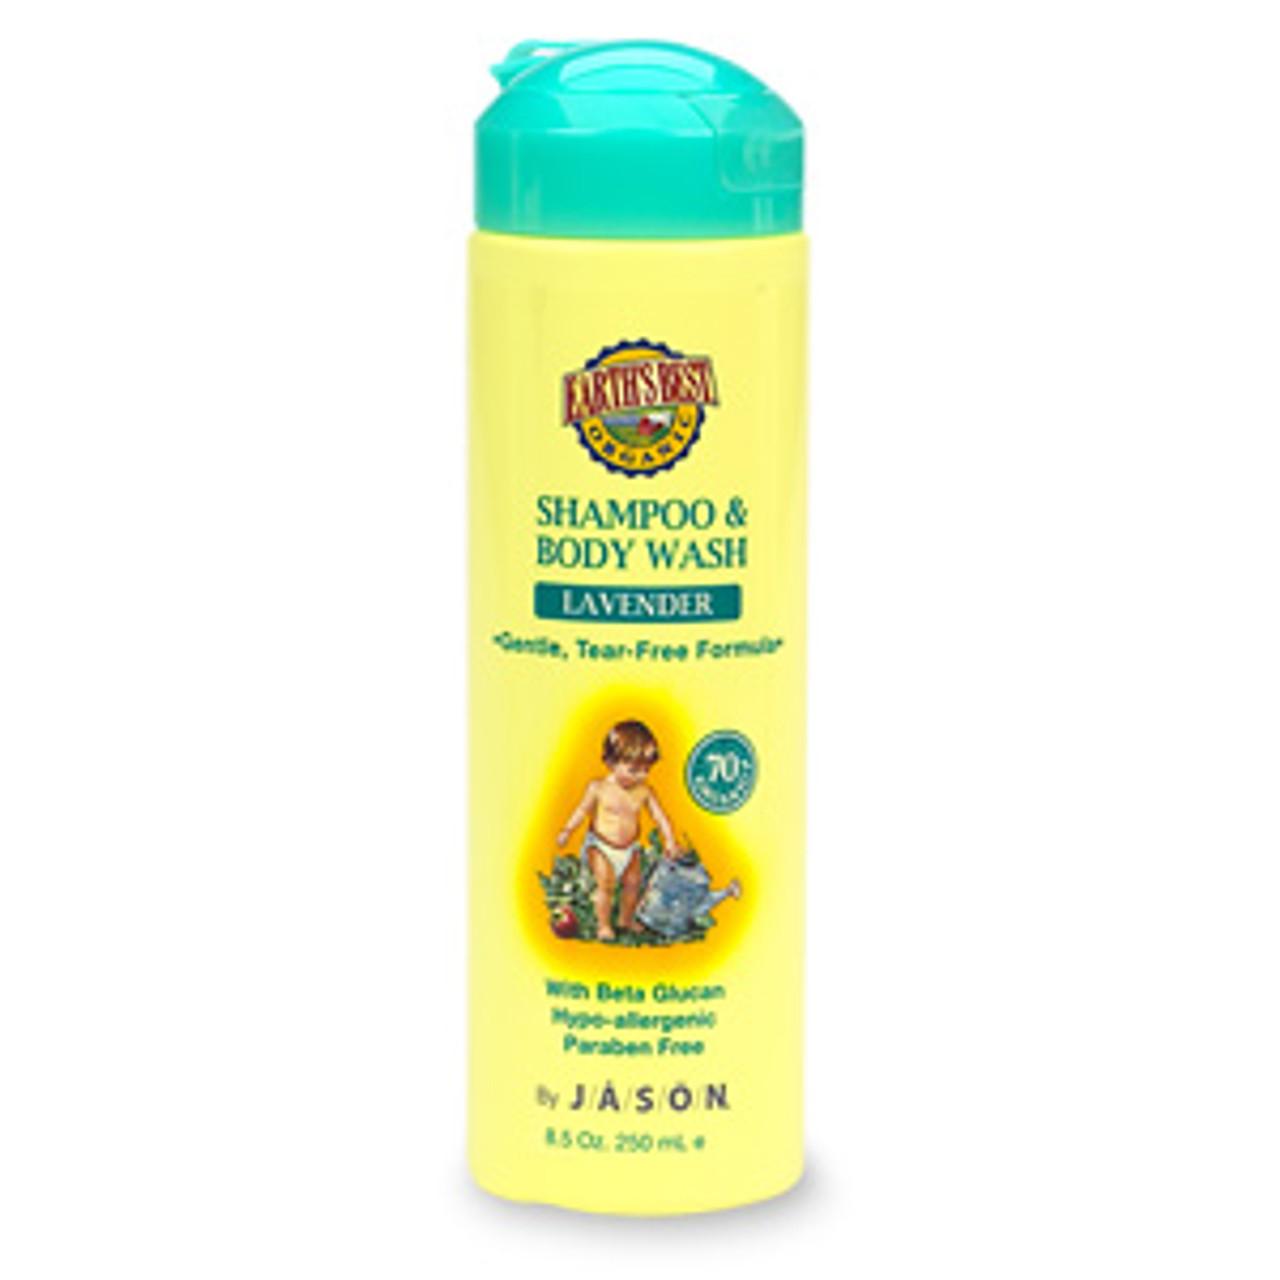 Baby Body Wash & Shampoo 8.5oz Jason Natural